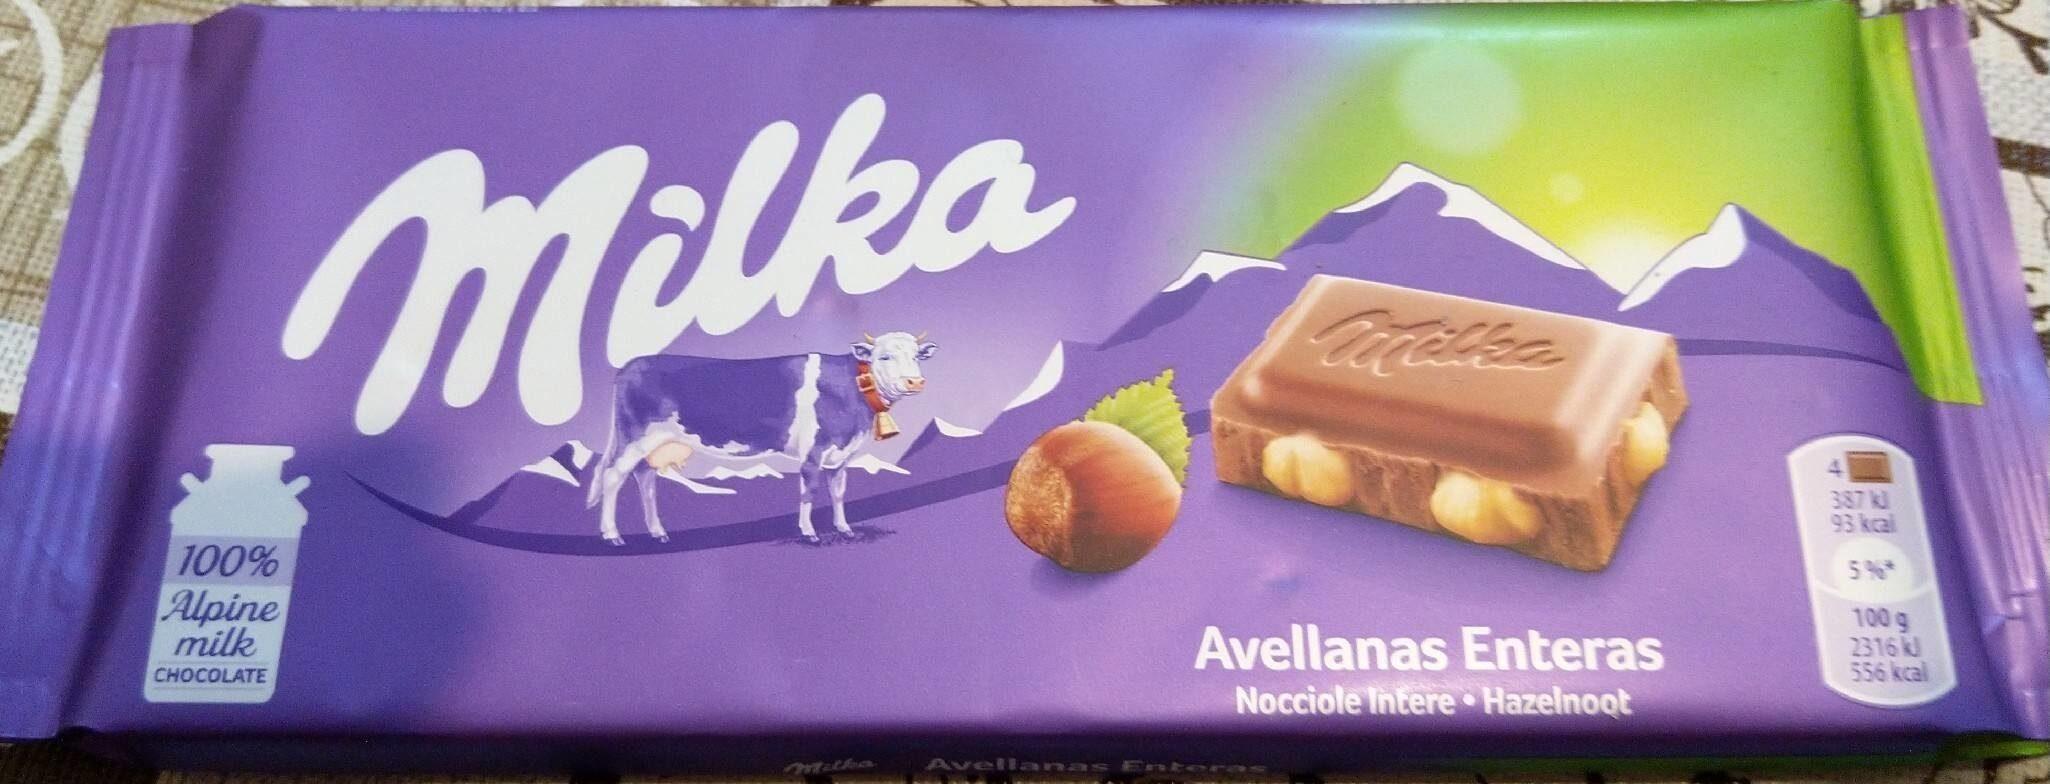 Milka Avellanas Enteras - Product - pt